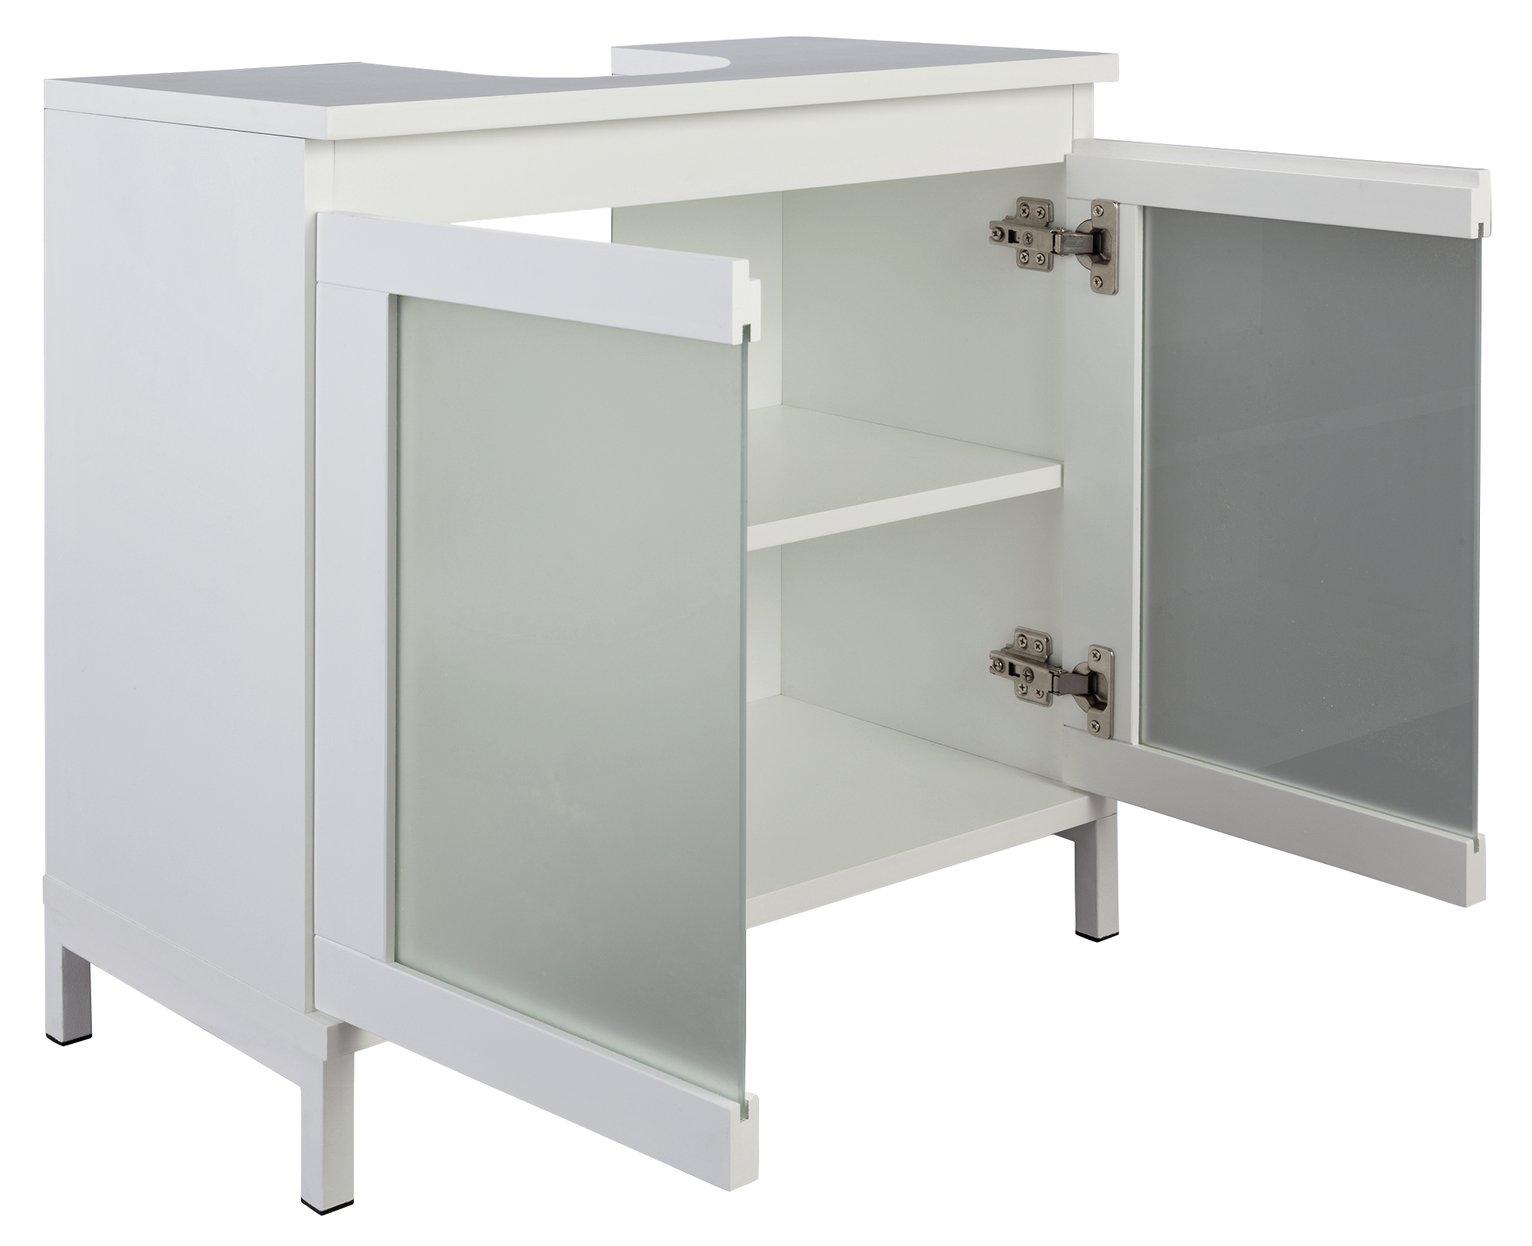 Buy Hygena Ice Undersink Storage Unit White Bathroom Shelves And